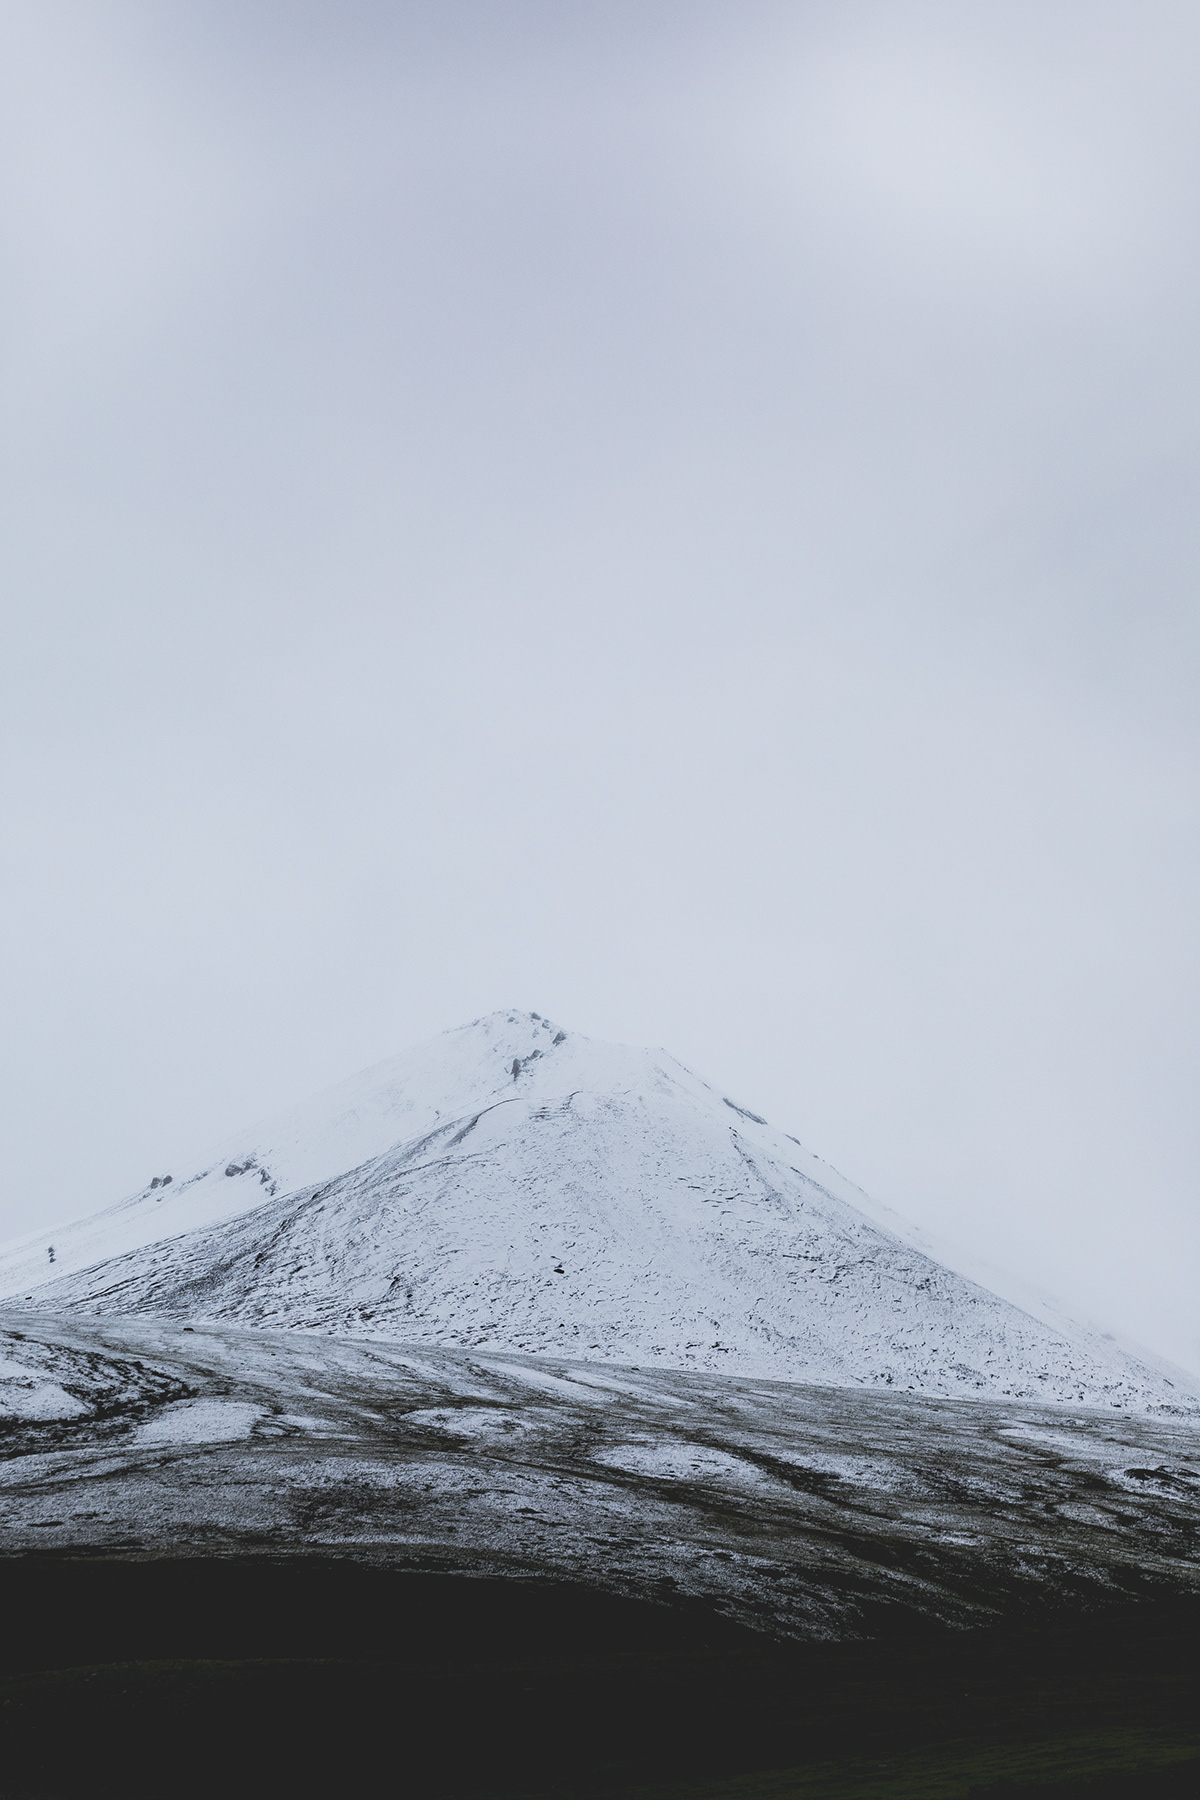 Alaska Arctic denali adventure hiking northern mountains sunset Nature wilderness